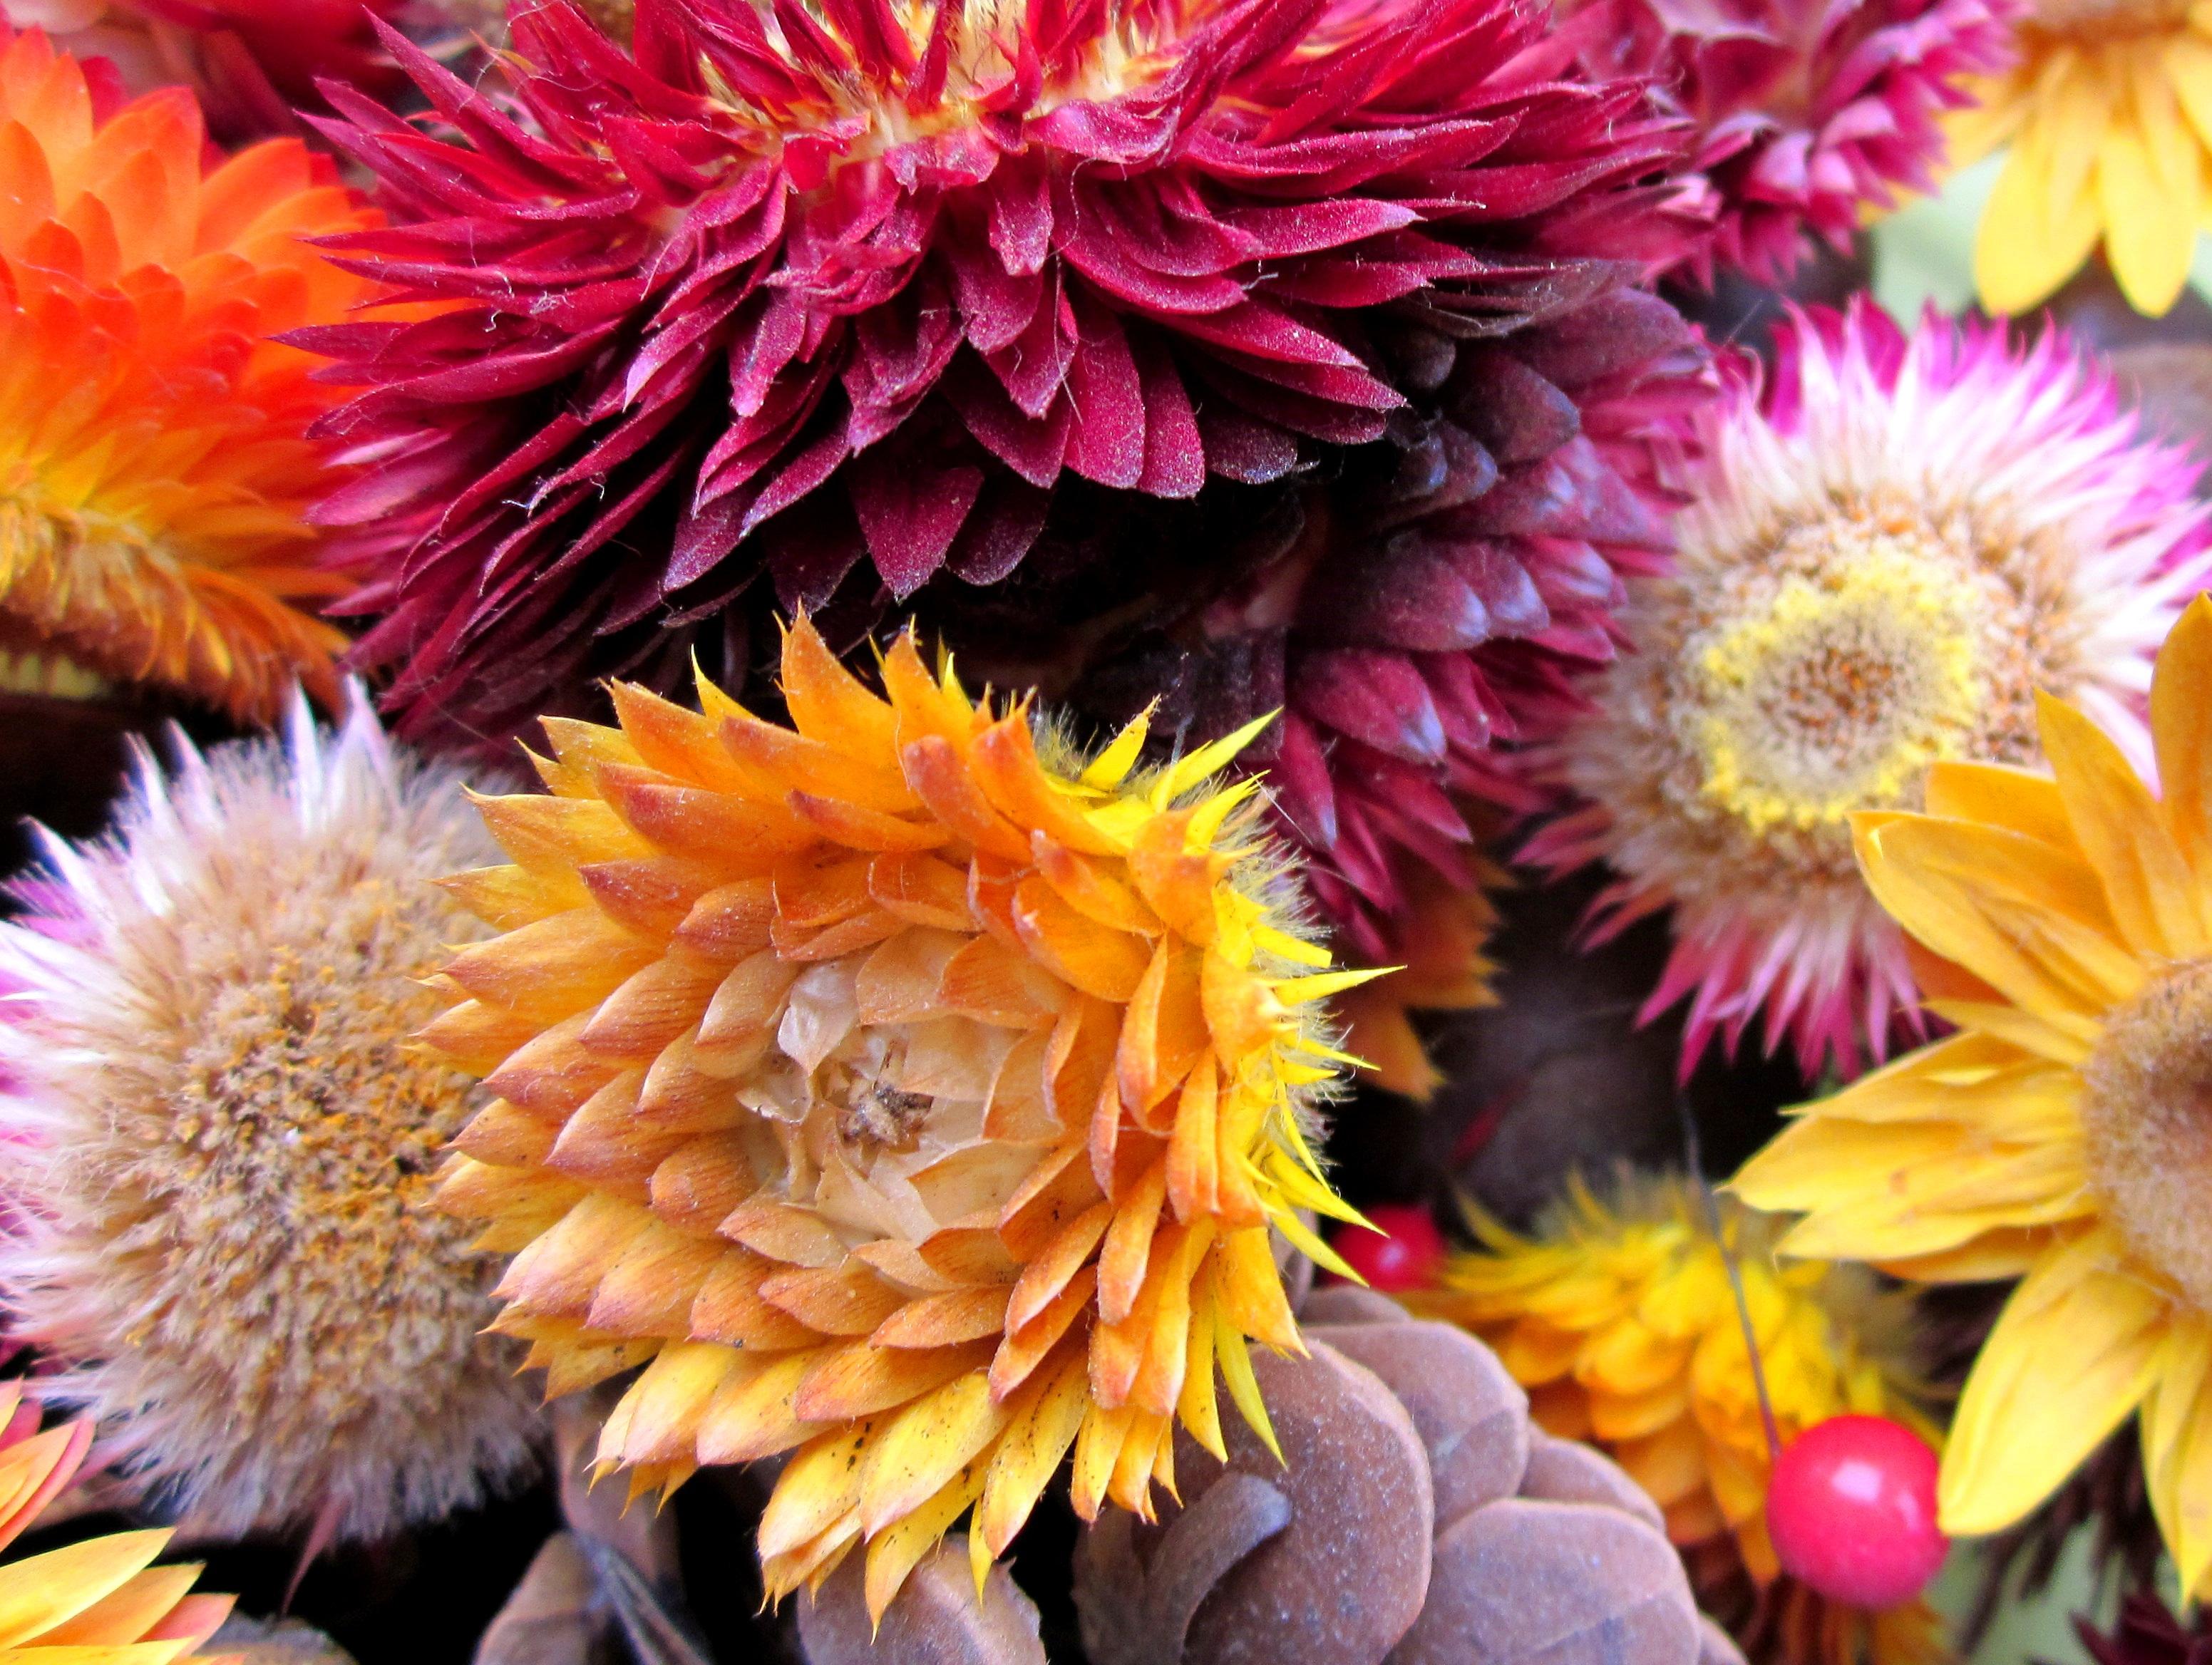 Free Images Petal Dry Flora Floristry Flowering Plant Daisy